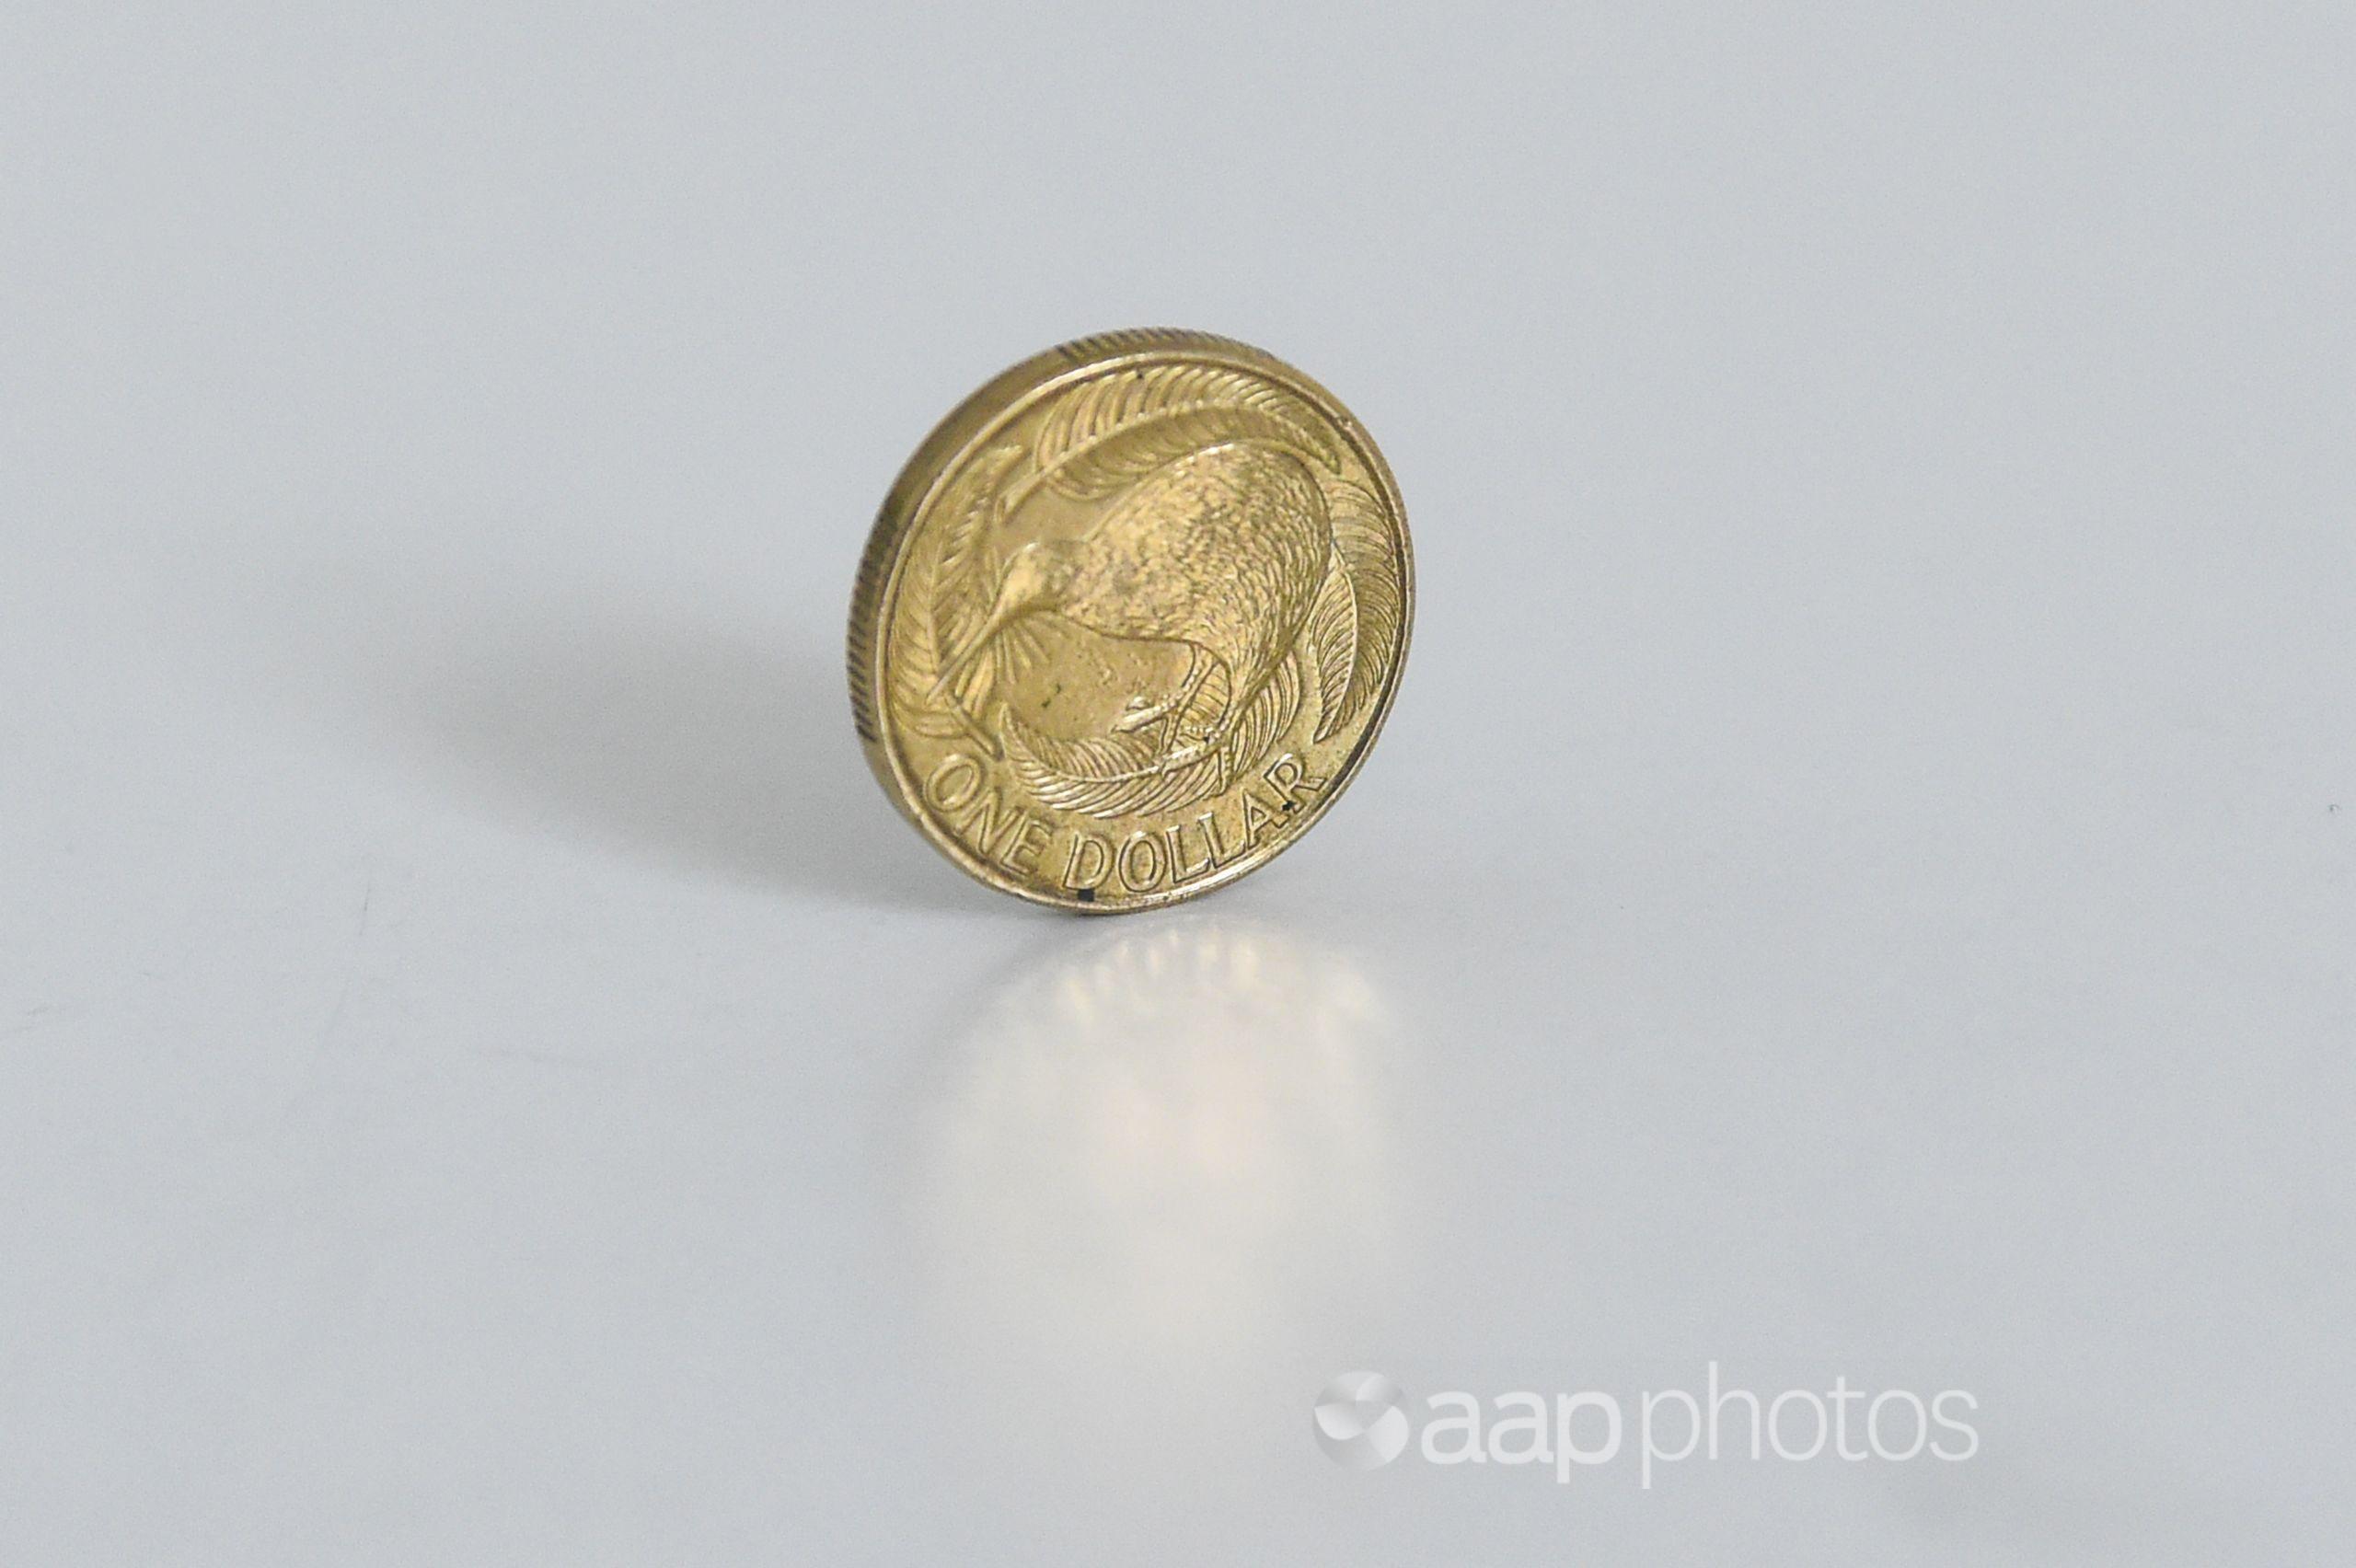 A New Zealand Dollar coin